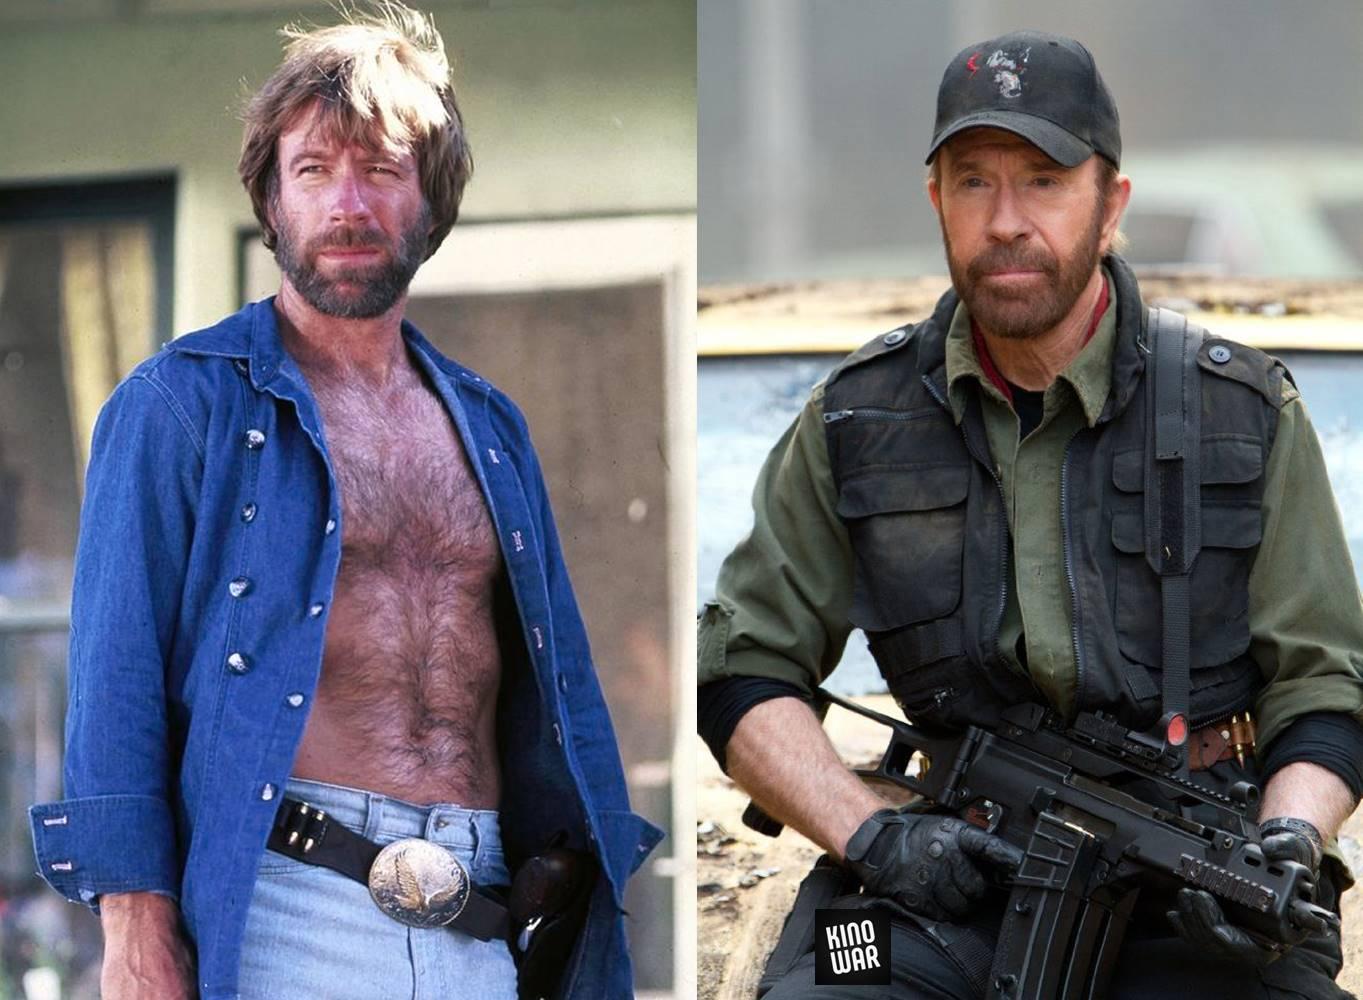 Герои боевиков 80-х 90-х тогда и сейчас Чак Норрис